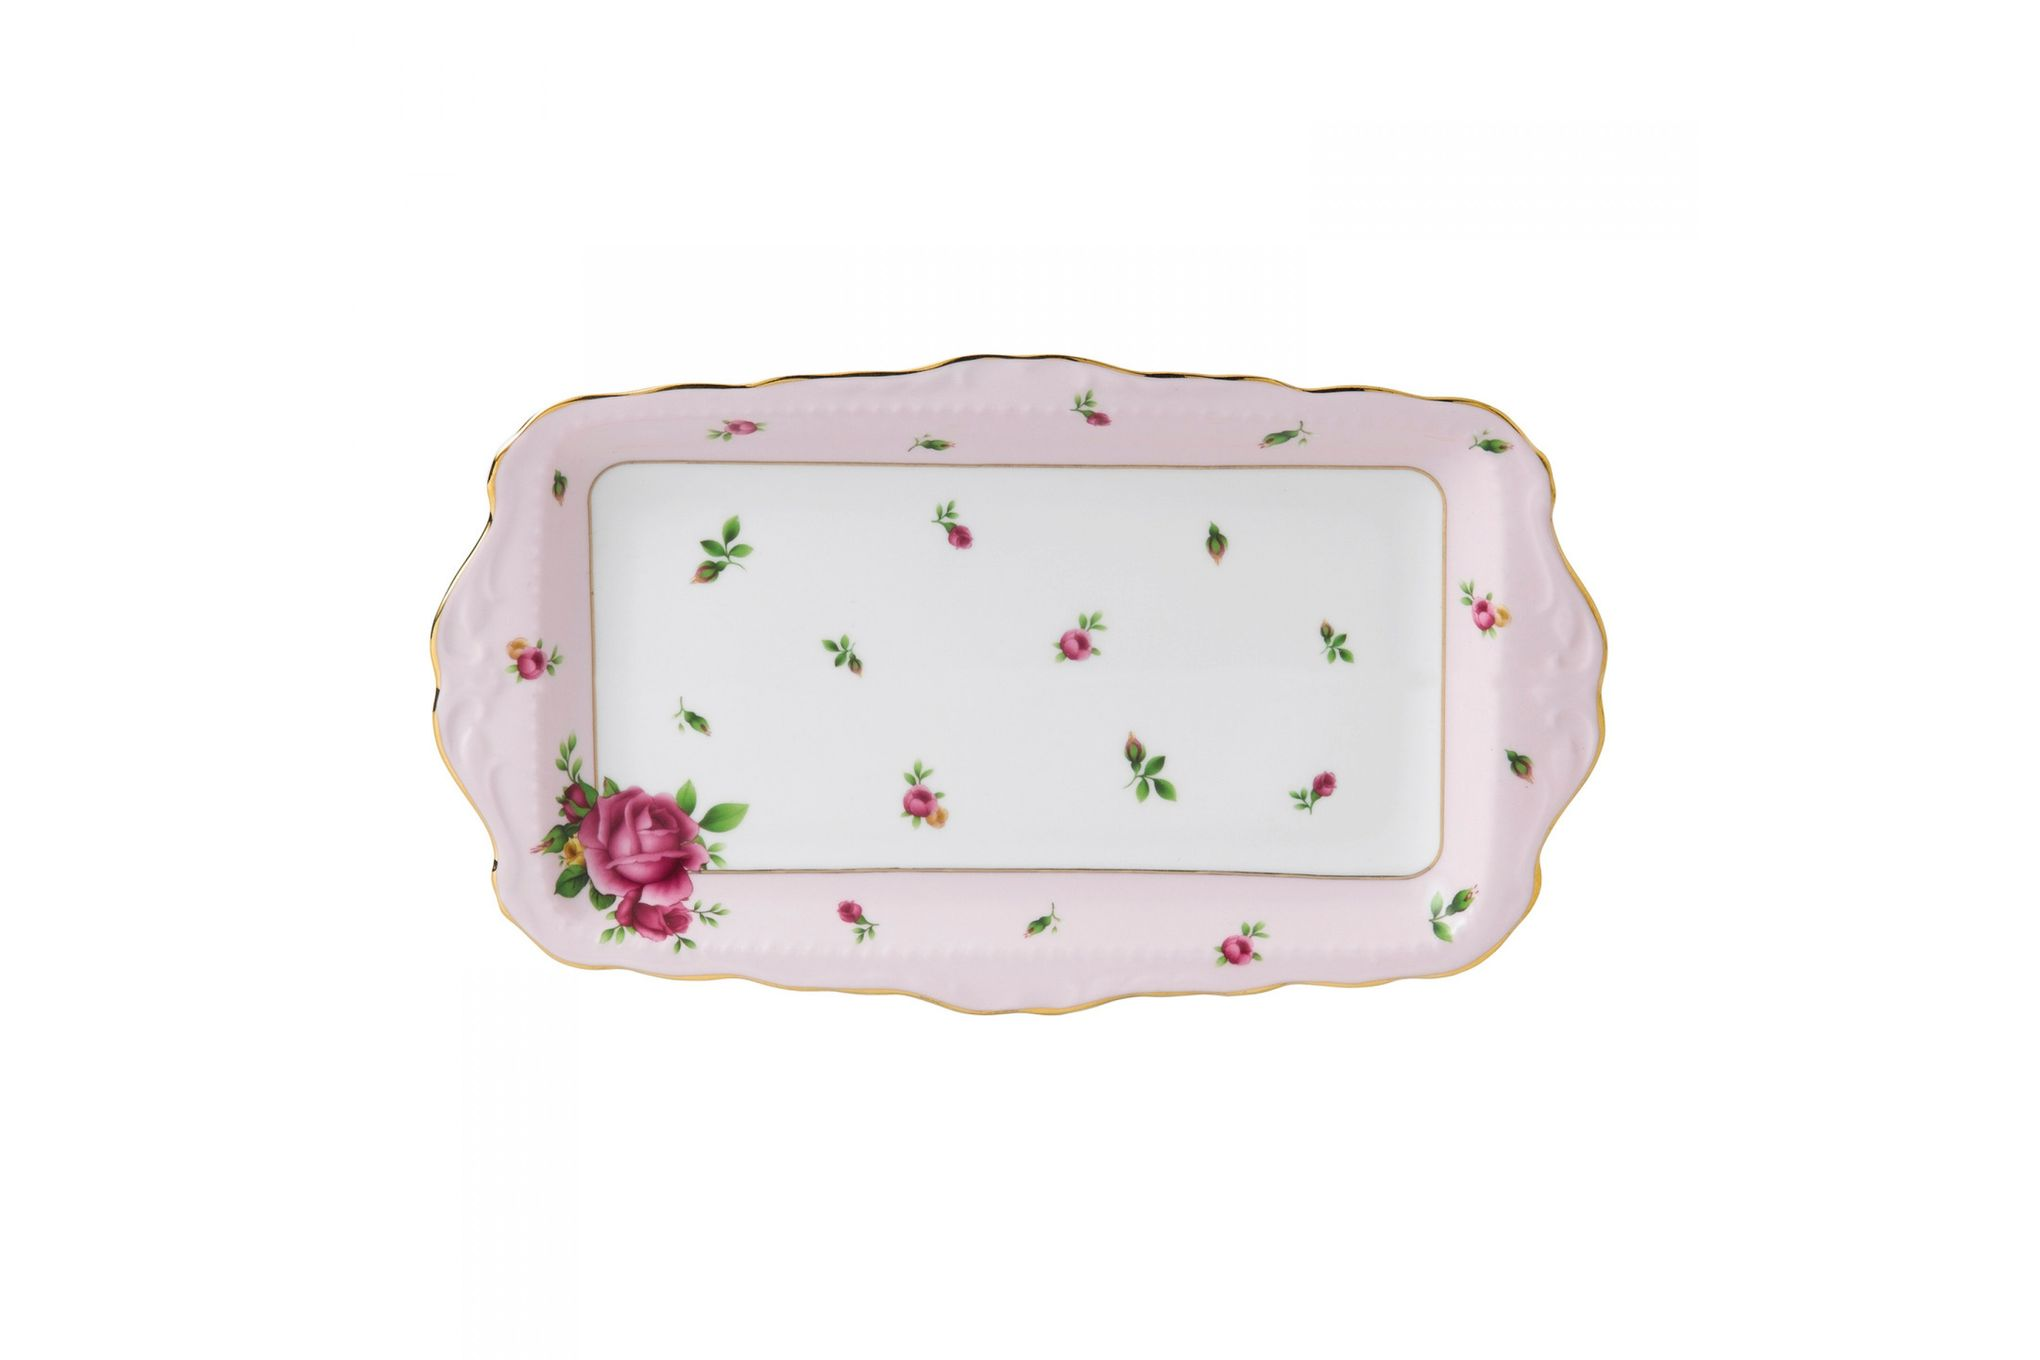 Royal Albert New Country Roses Pink Sandwich Tray Boxed thumb 1